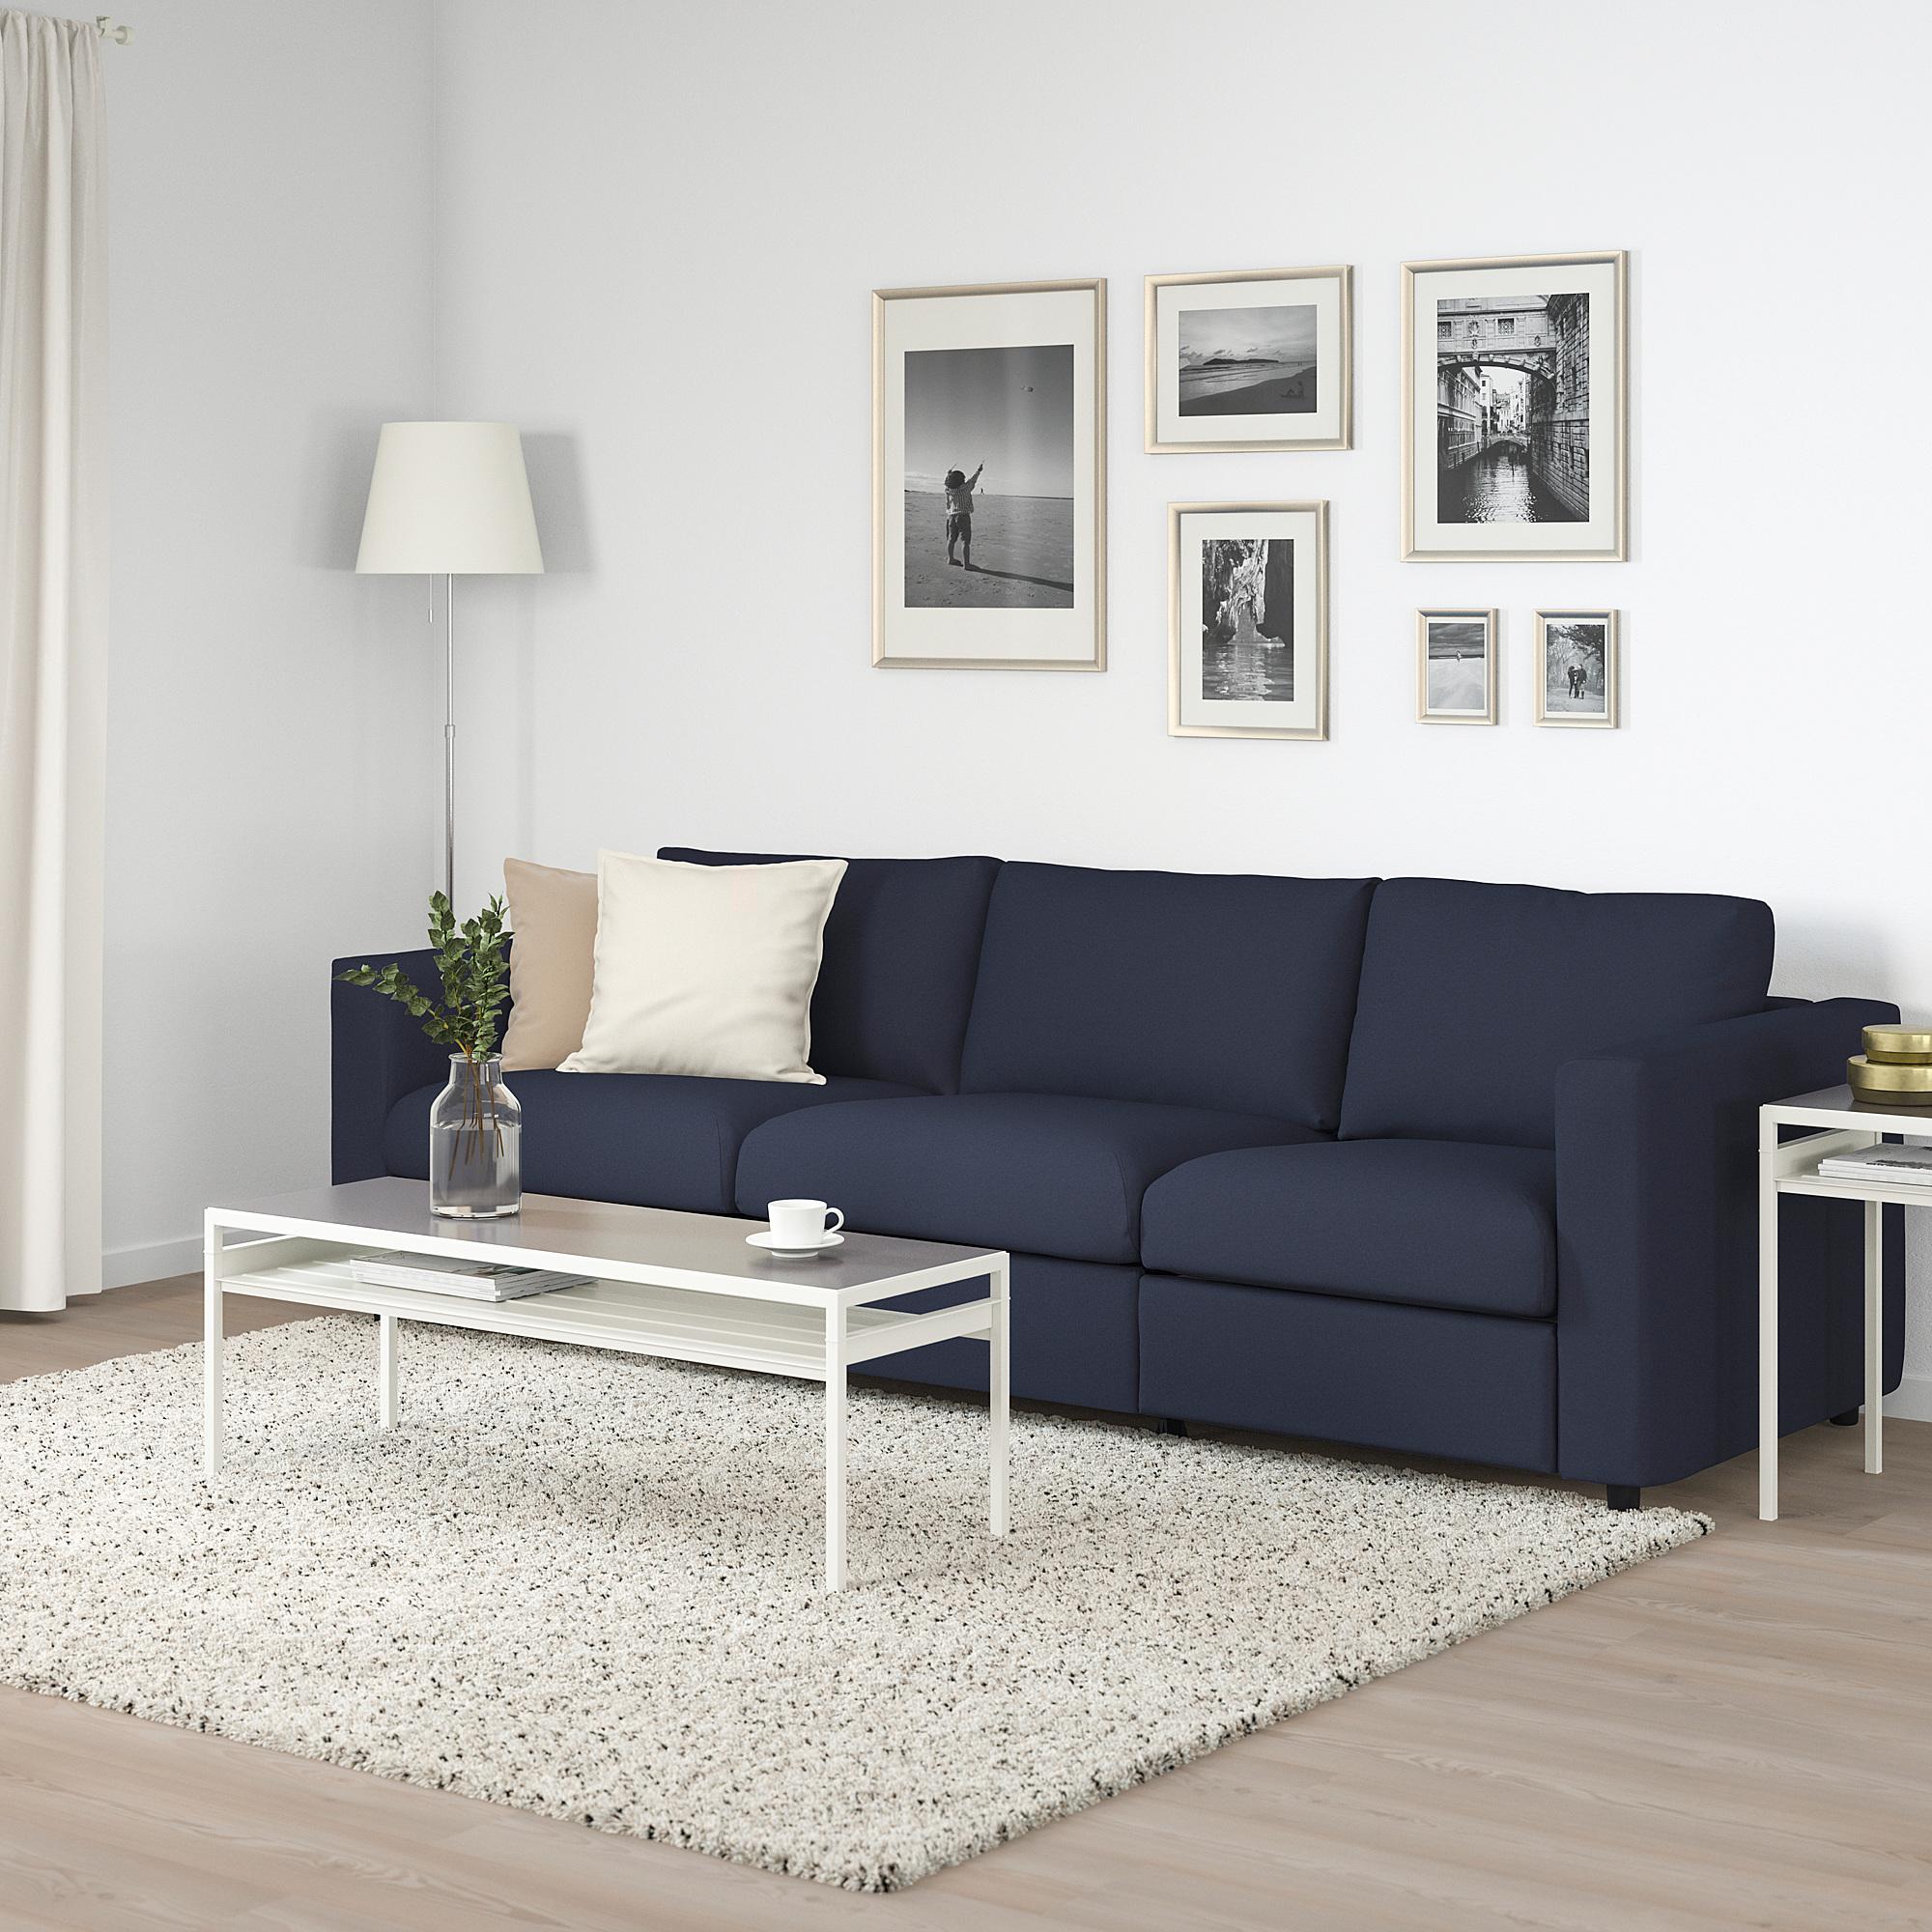 VIMLE   3 seat sofa bed, Orrsta black blue   IKEA Hong ...